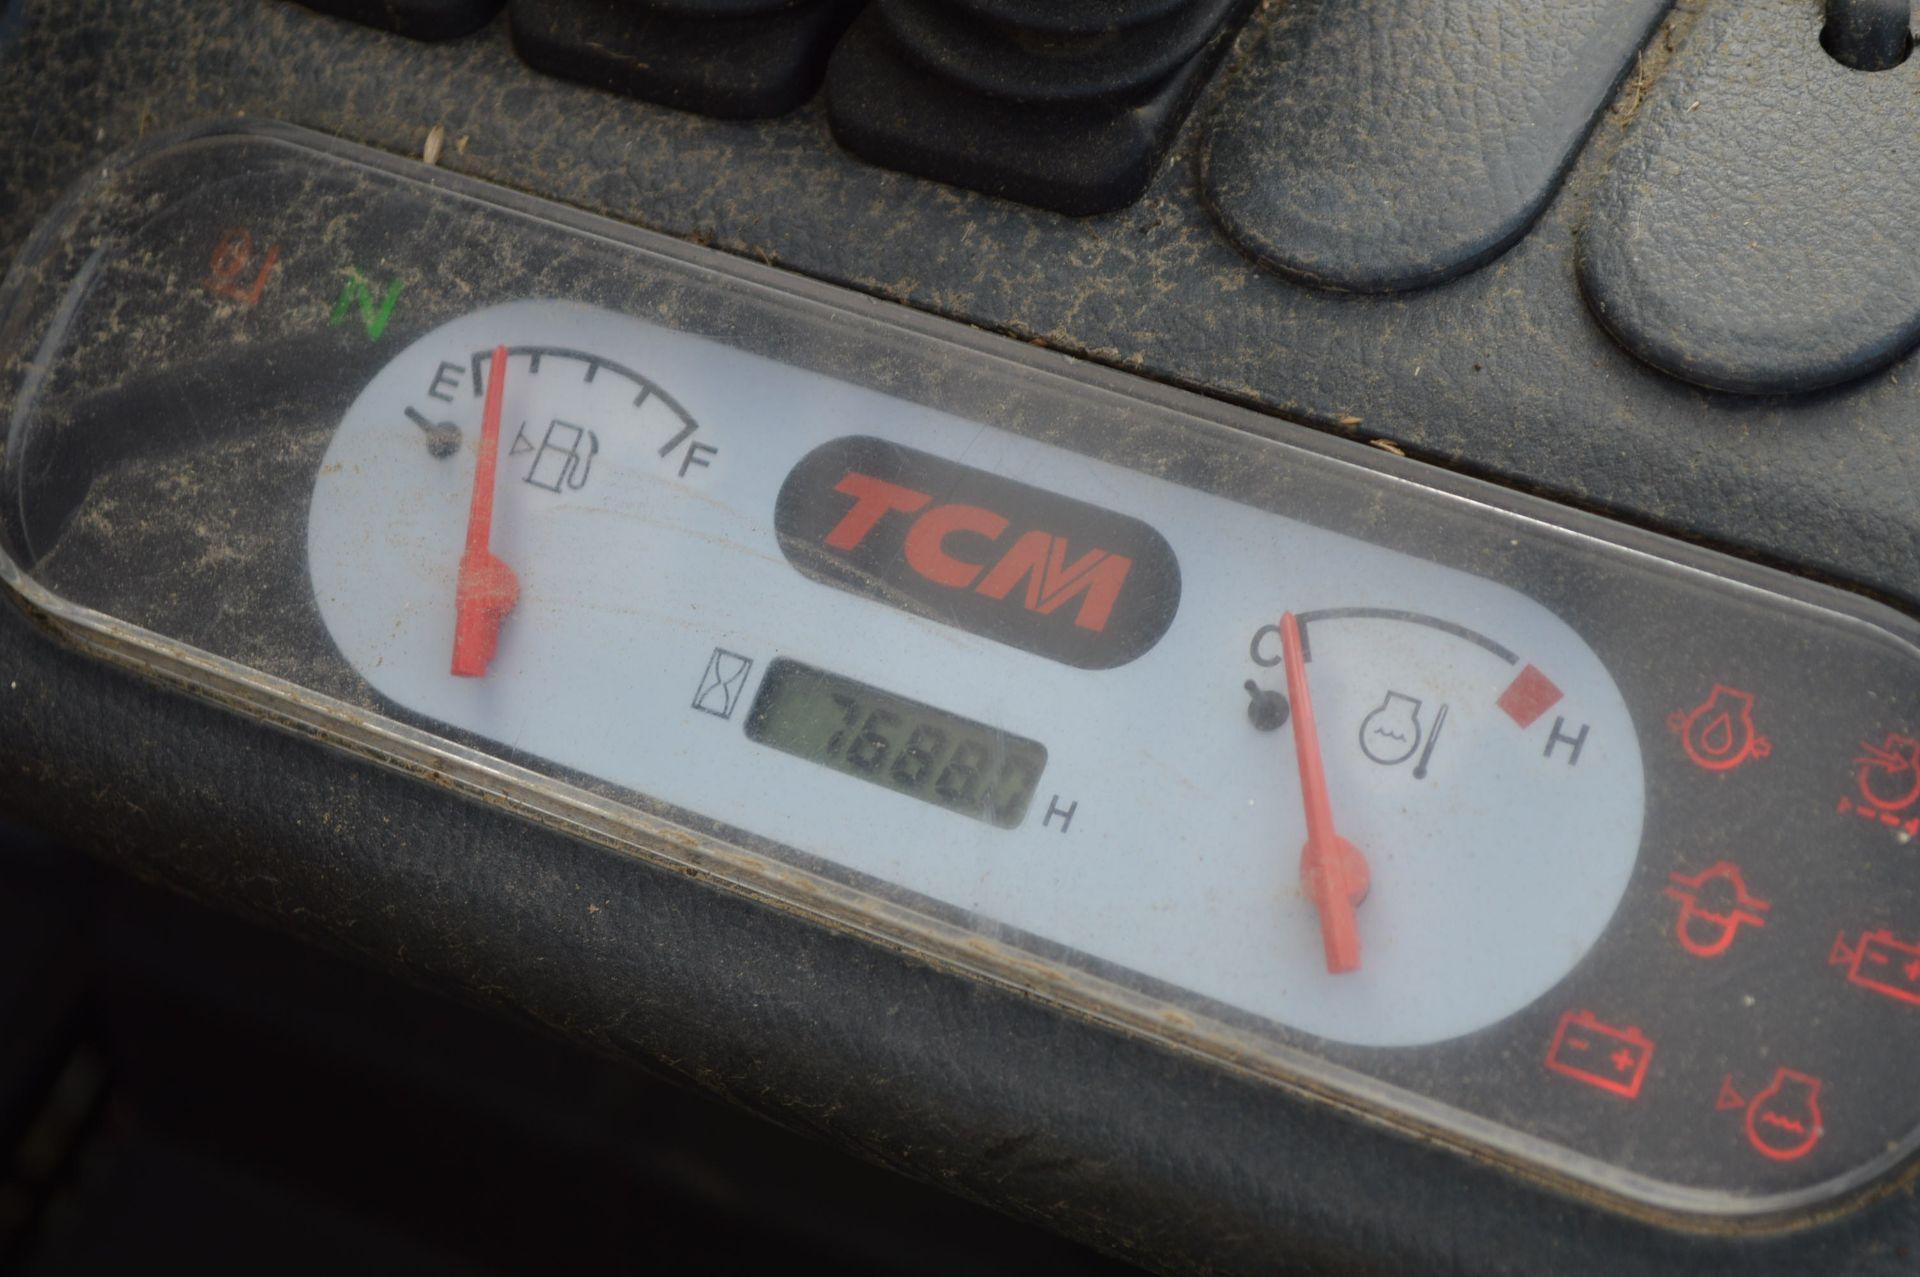 2007 TCM FD25T3 FORKLIFT, 2500KG RATED CAPACITY *PLUS VAT* - Image 7 of 8